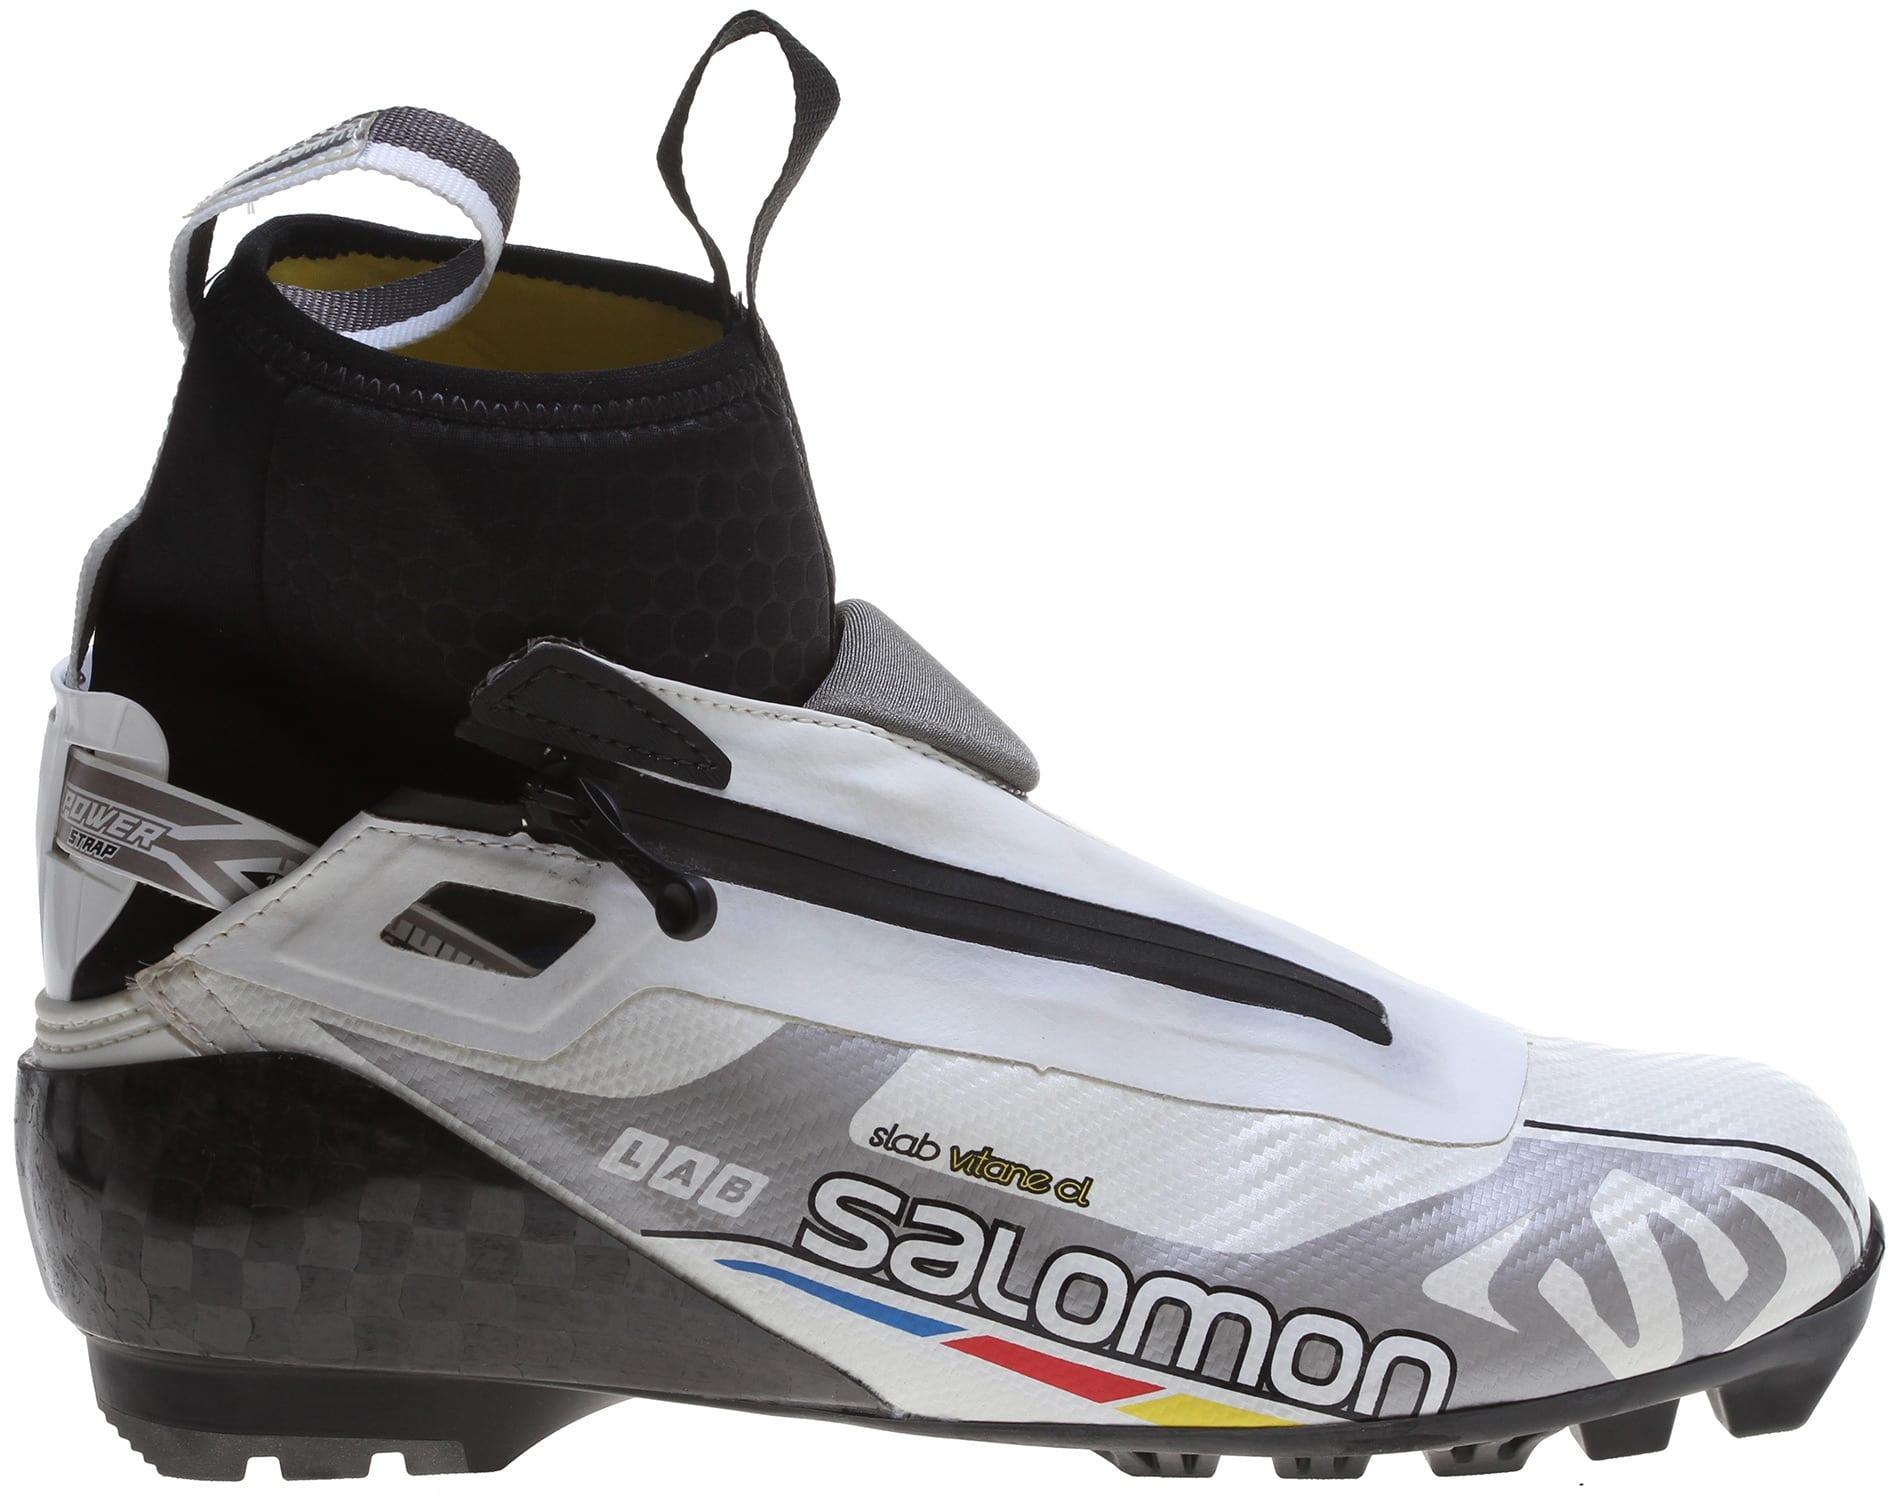 Salomon S-Lab Vitane Classic XC Ski Boots